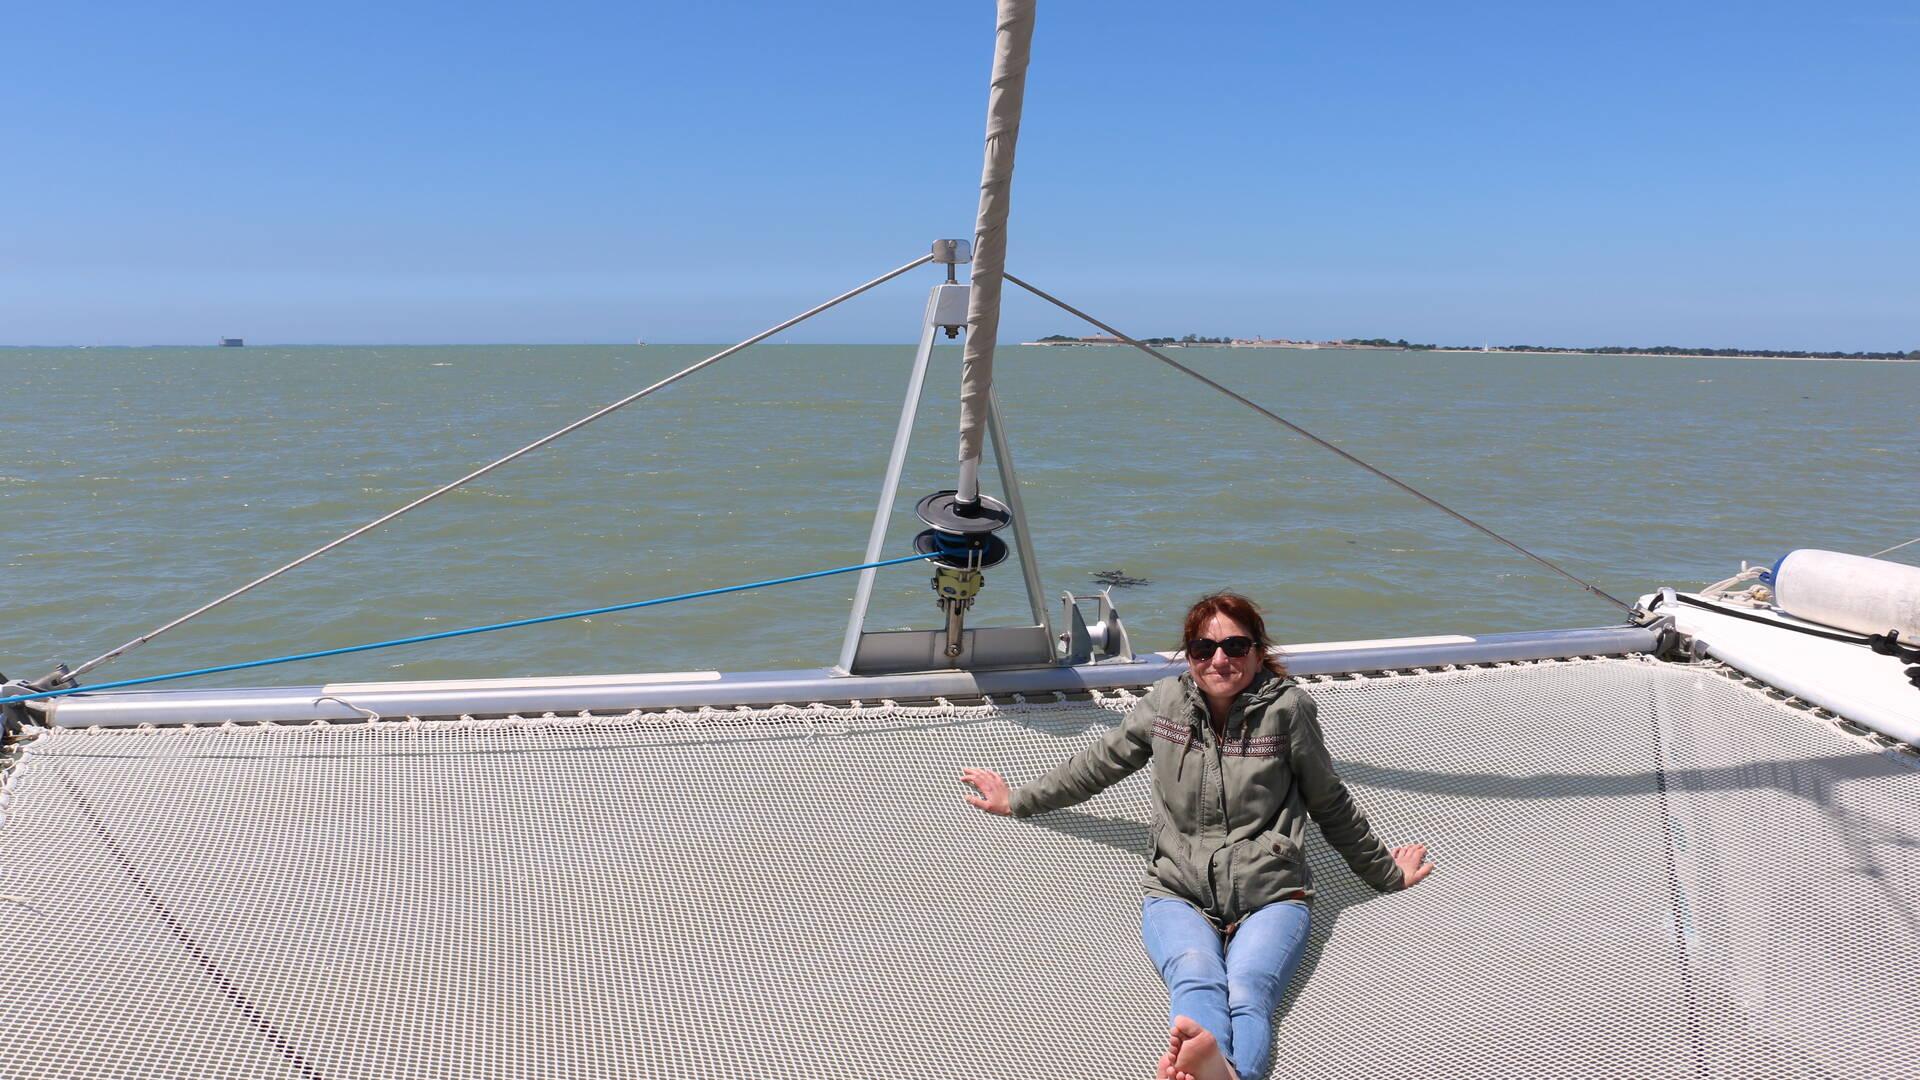 Sur le trampoline du catamaran Vertige